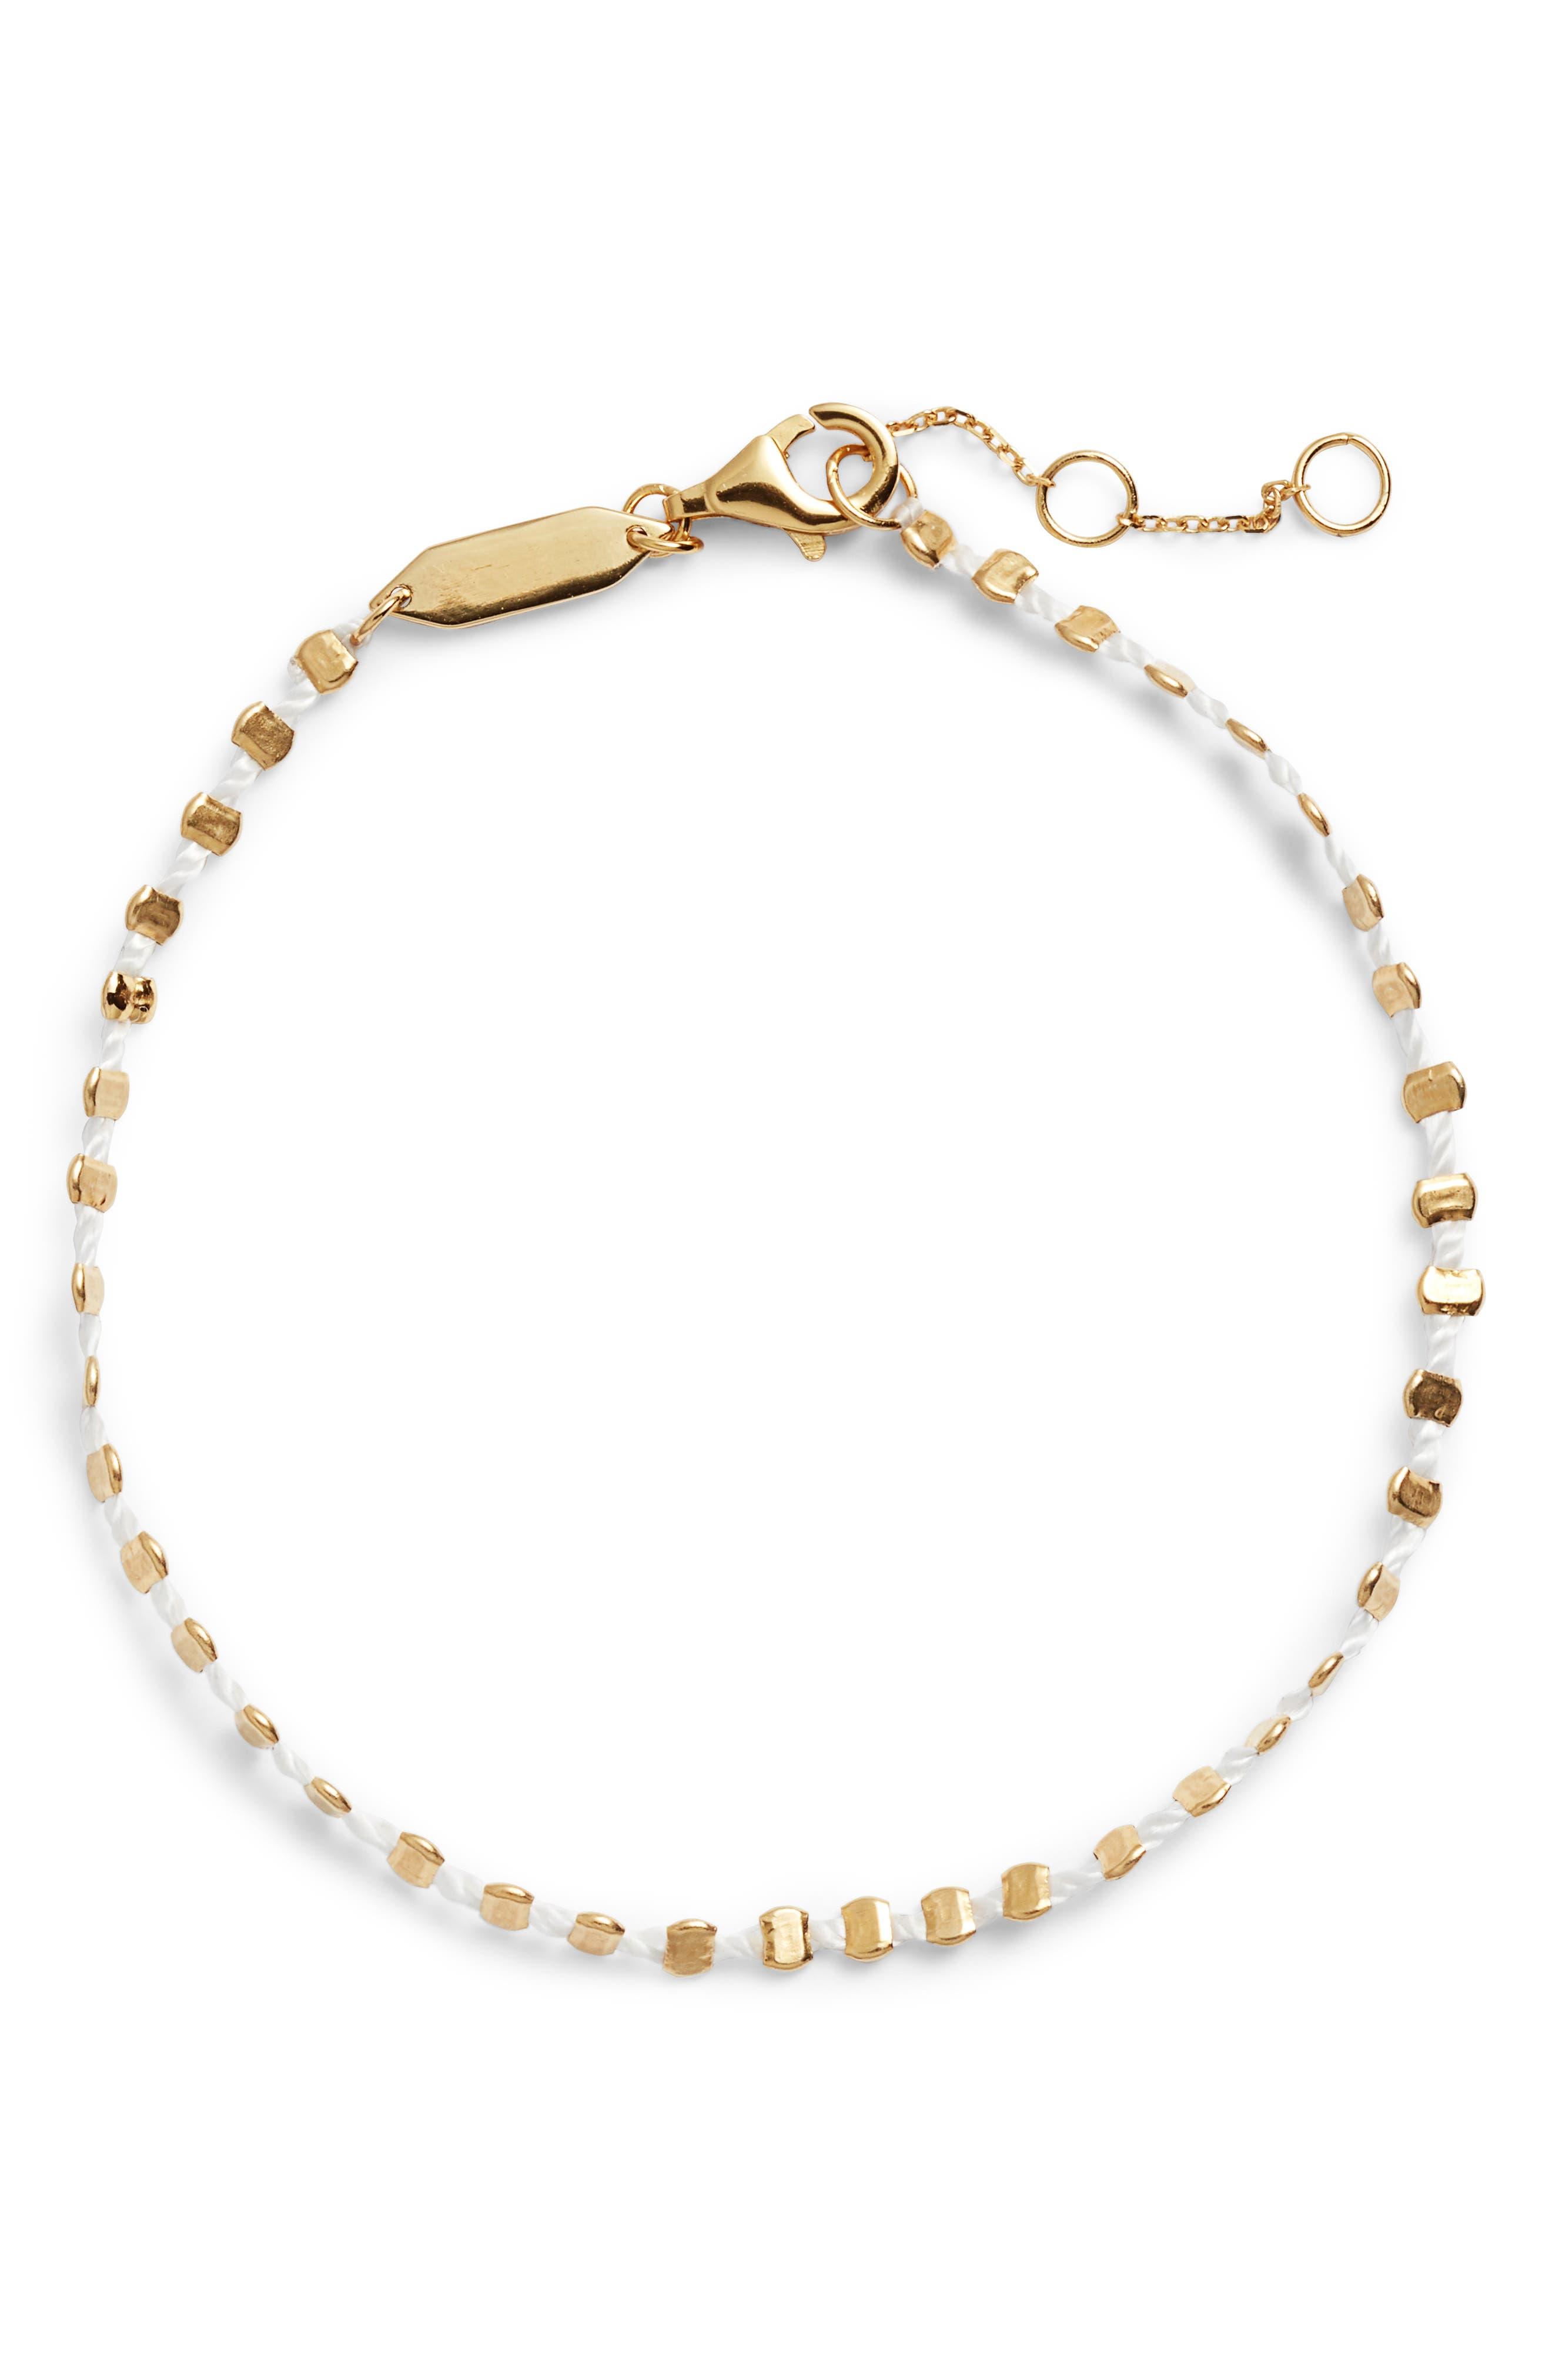 Sydney Beaded Rope Bracelet,                         Main,                         color, Gold